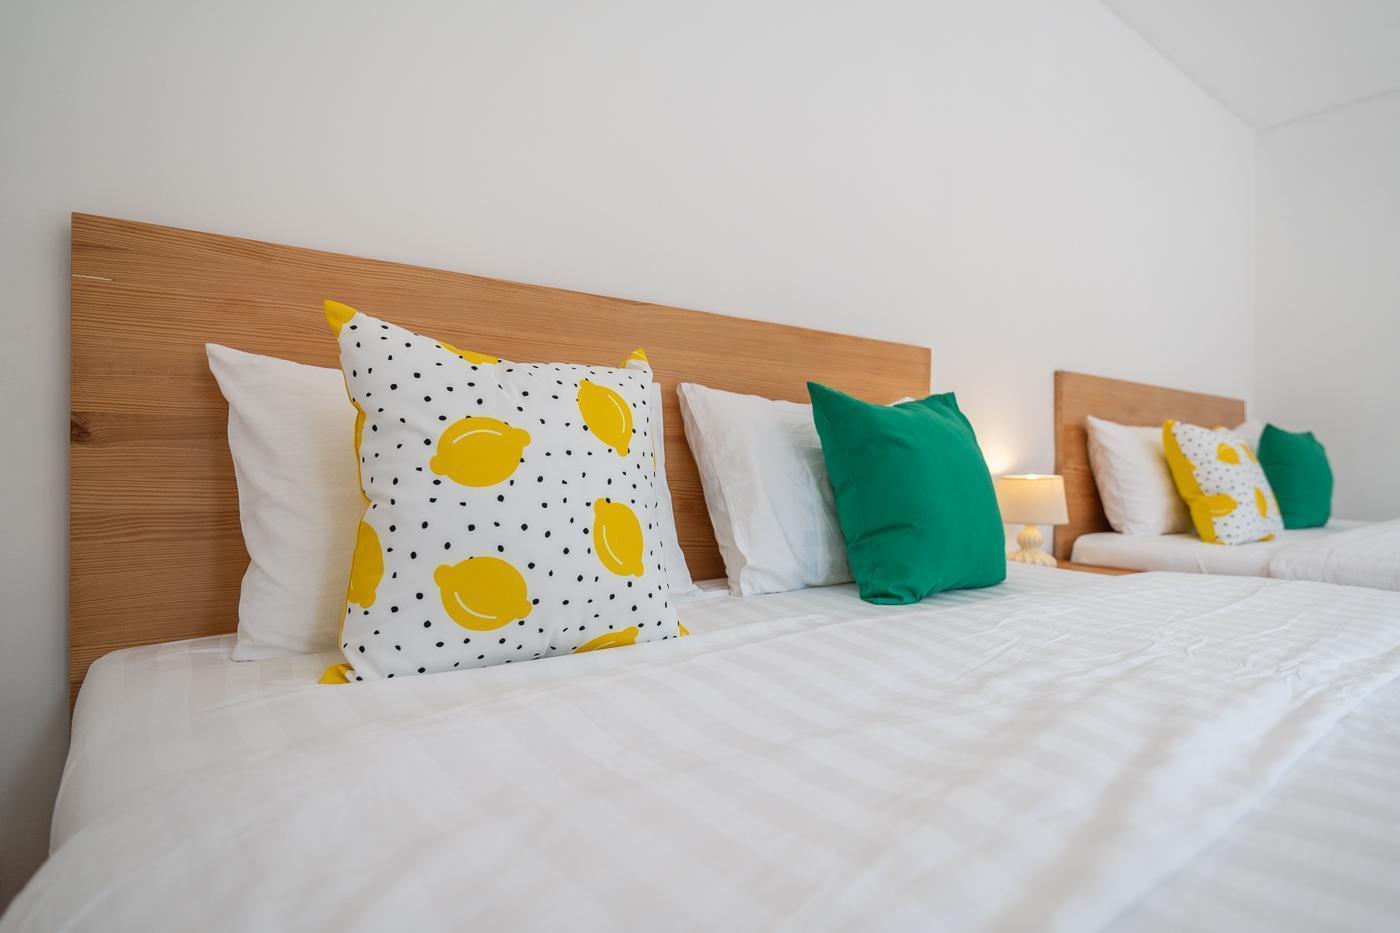 Lemon Pool Villa Pattaya วิลลา 3 ห้องนอน 4 ห้องน้ำส่วนตัว ขนาด 120 ตร.ม. – บางสเหร่